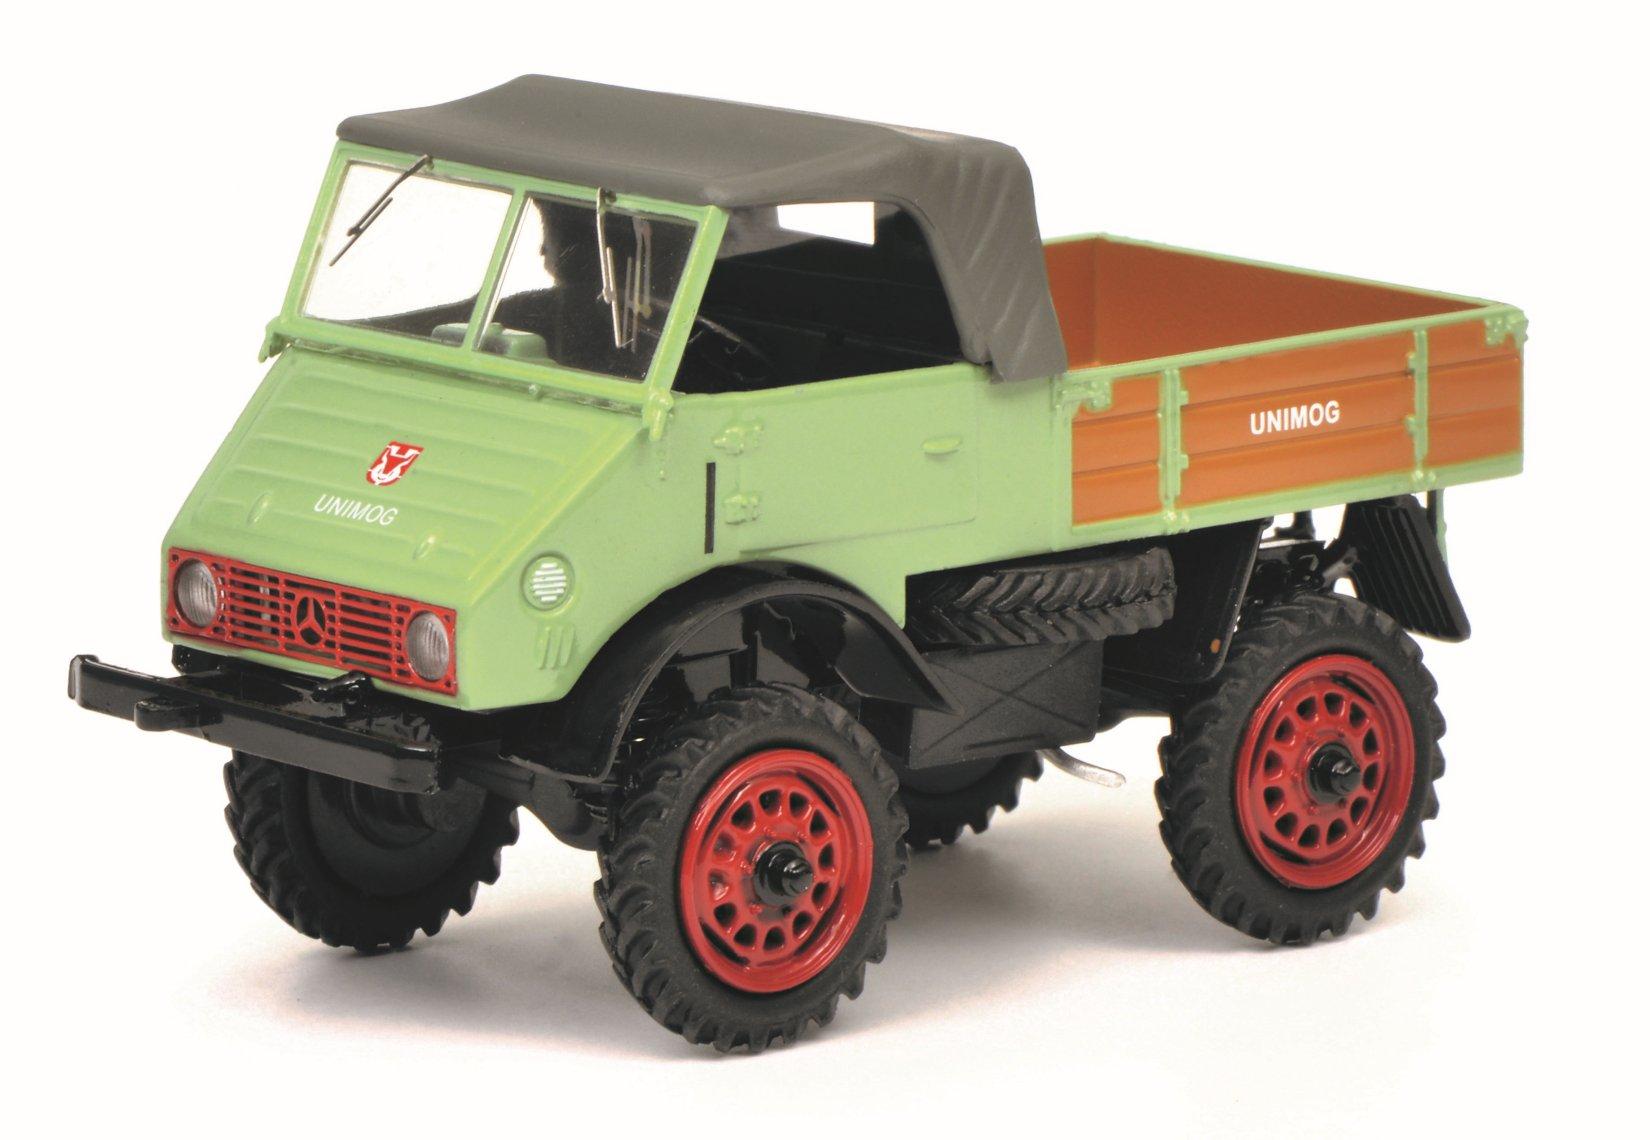 Schuco model Unimog 401 - 1:43